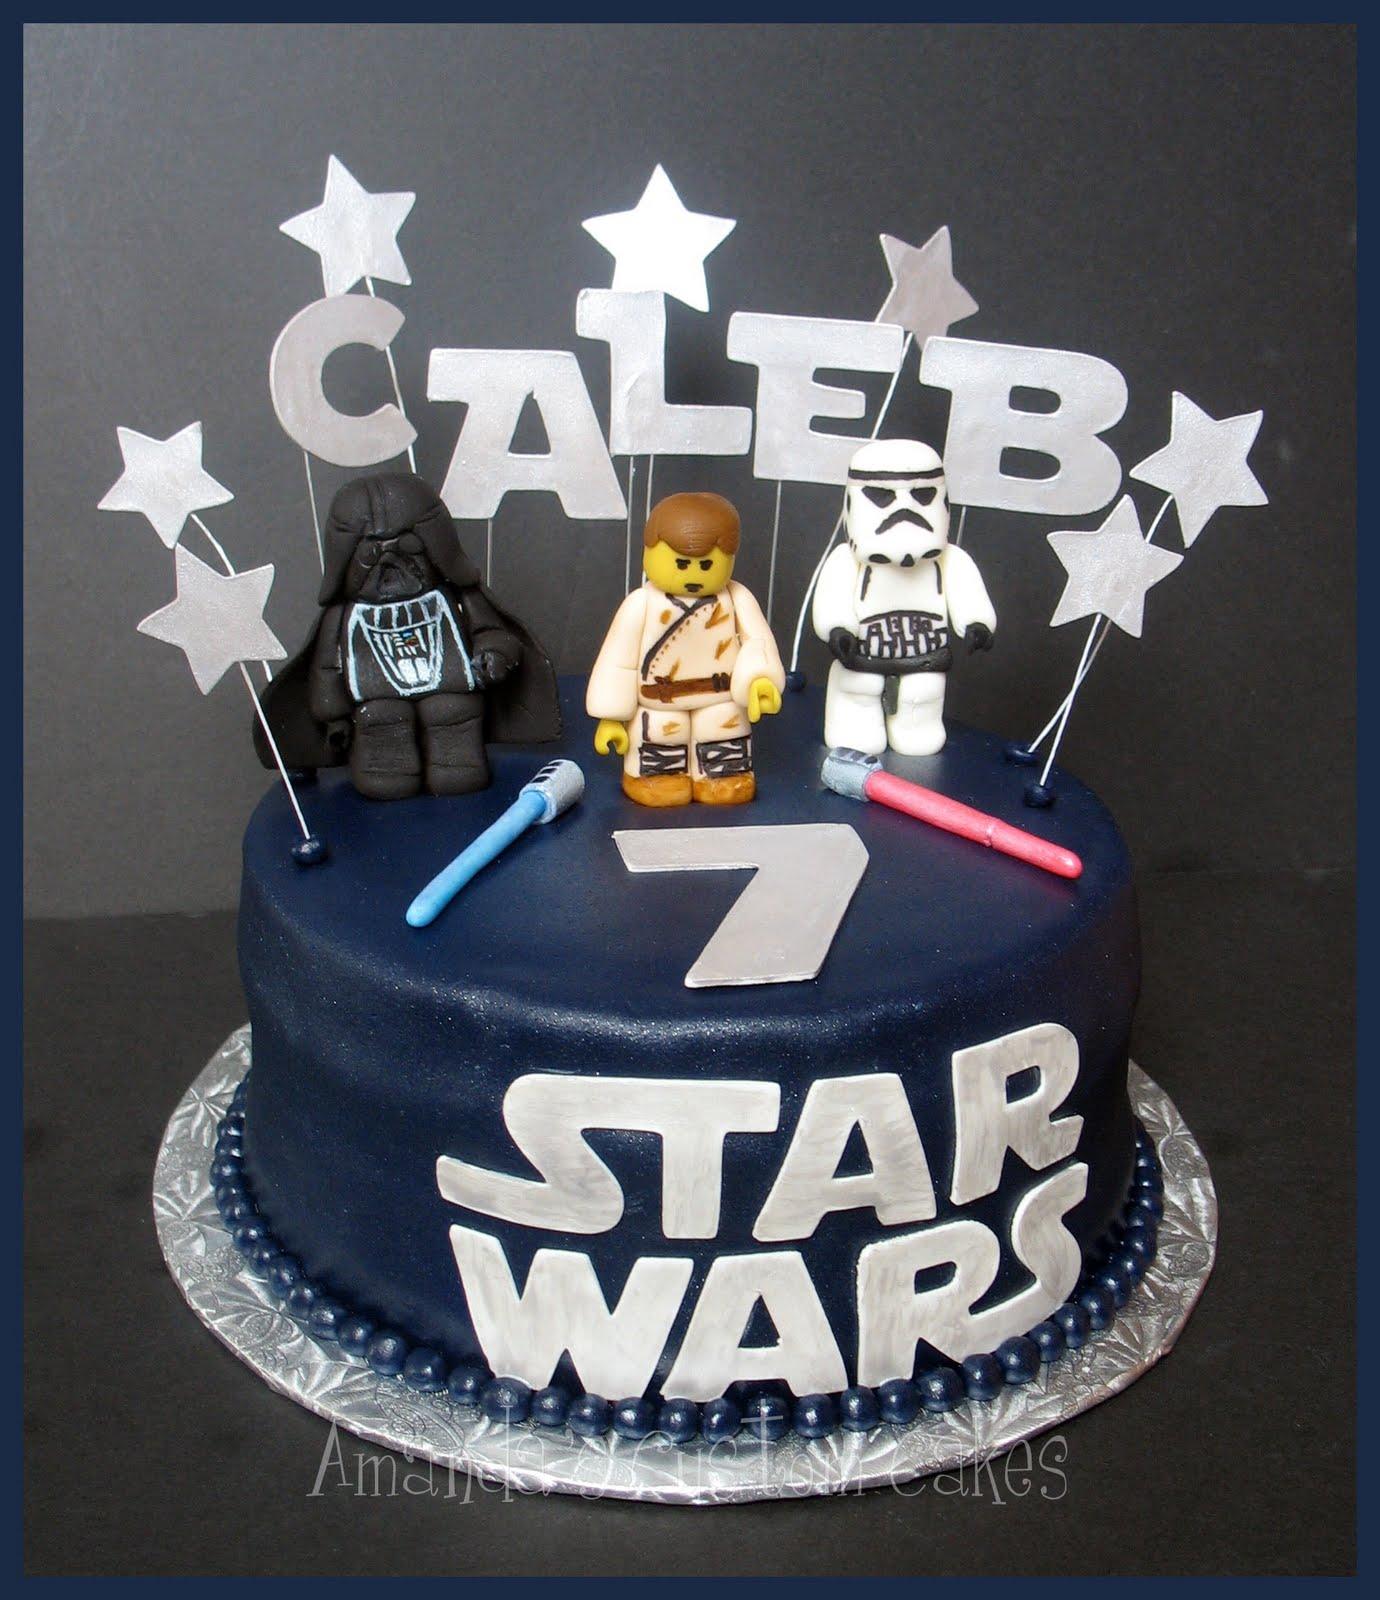 Astonishing 9 Easy Lego Star Wars Cakes Photo Lego Star Wars Cake Ideas Funny Birthday Cards Online Alyptdamsfinfo